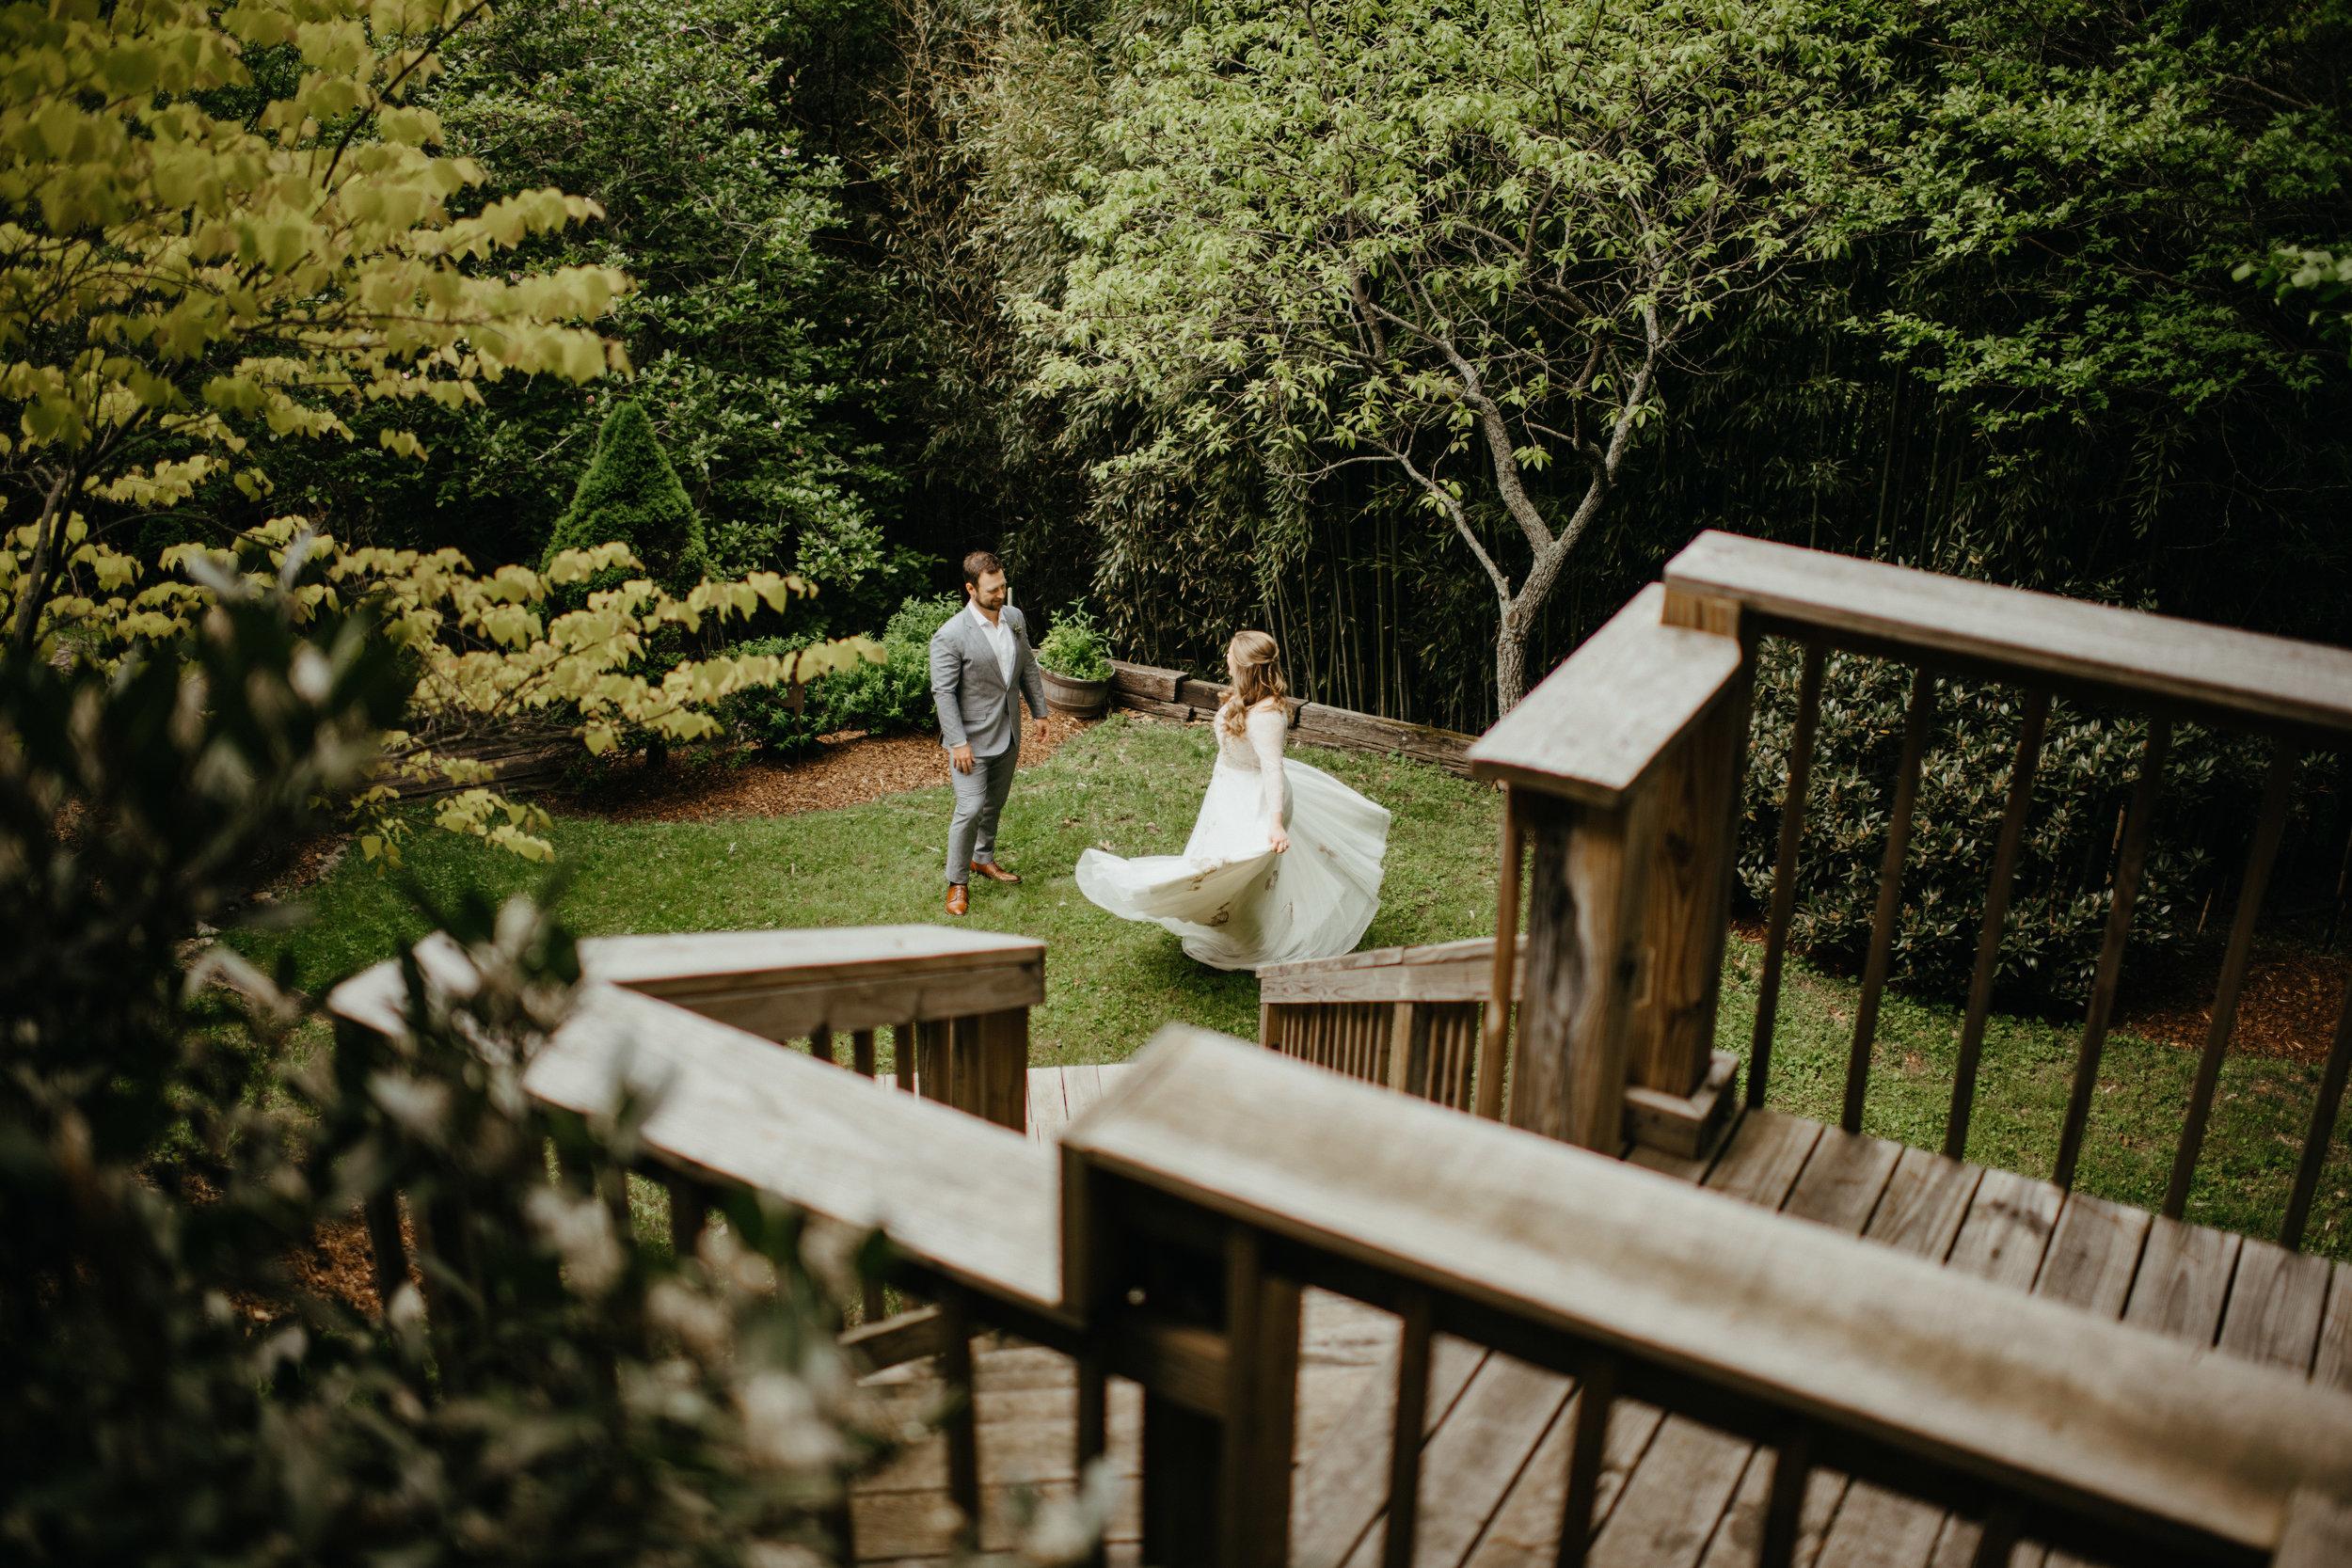 Elizabeth and Aldens Intimate Backyard wedding in Nashville Tennessee Wedding Photographer00002.jpg